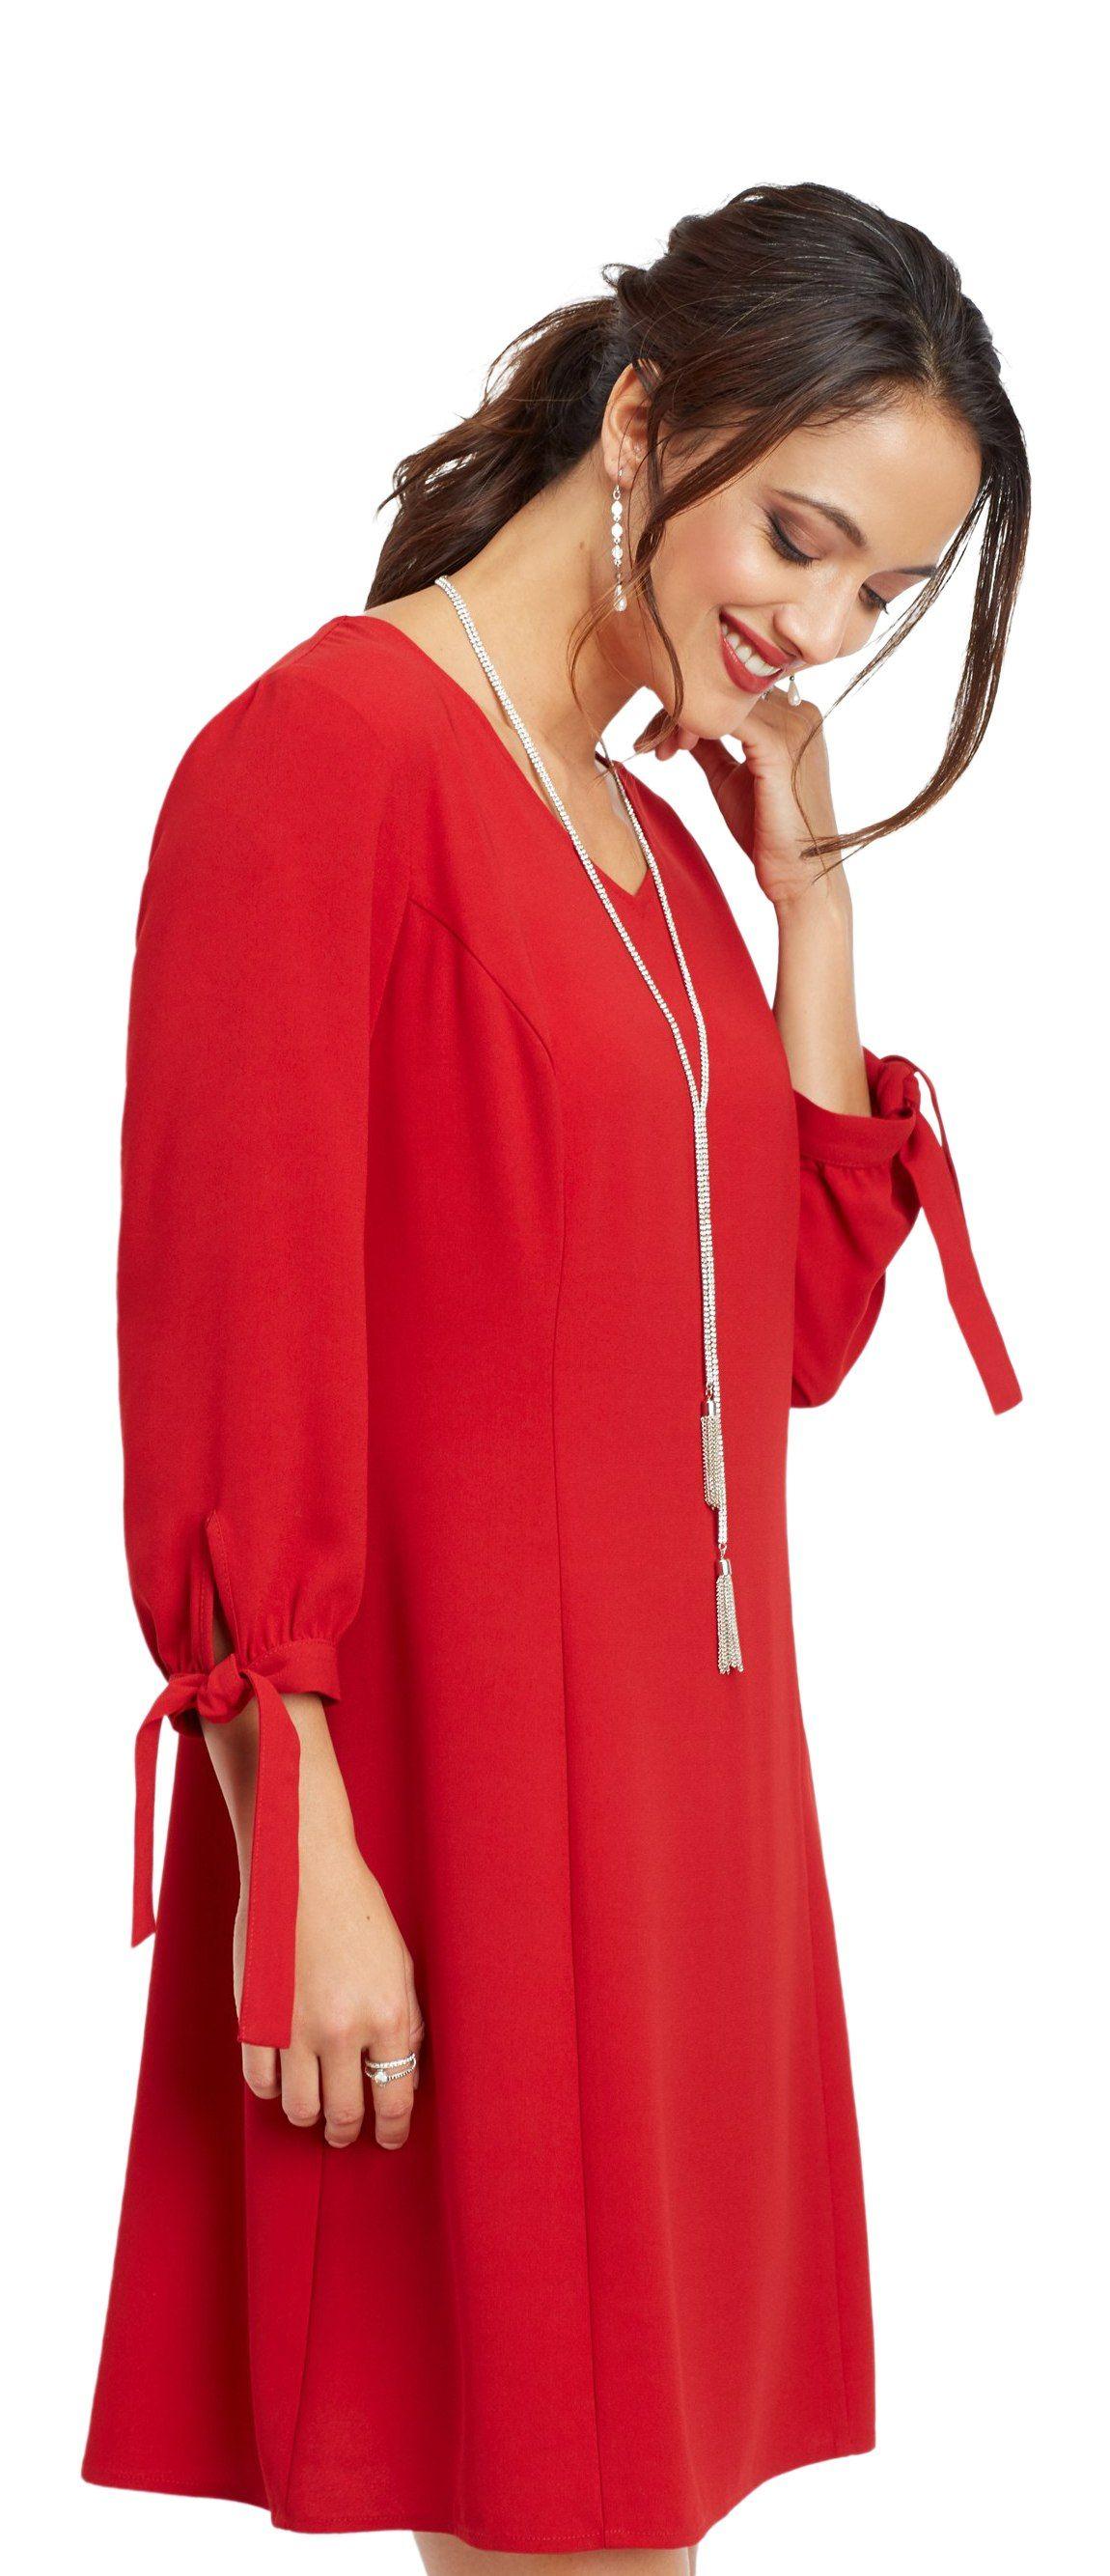 Maurices Tie Sleeve Shift Dress Walmart Com Shift Dress Dresses With Sleeves Dresses [ 2668 x 1150 Pixel ]